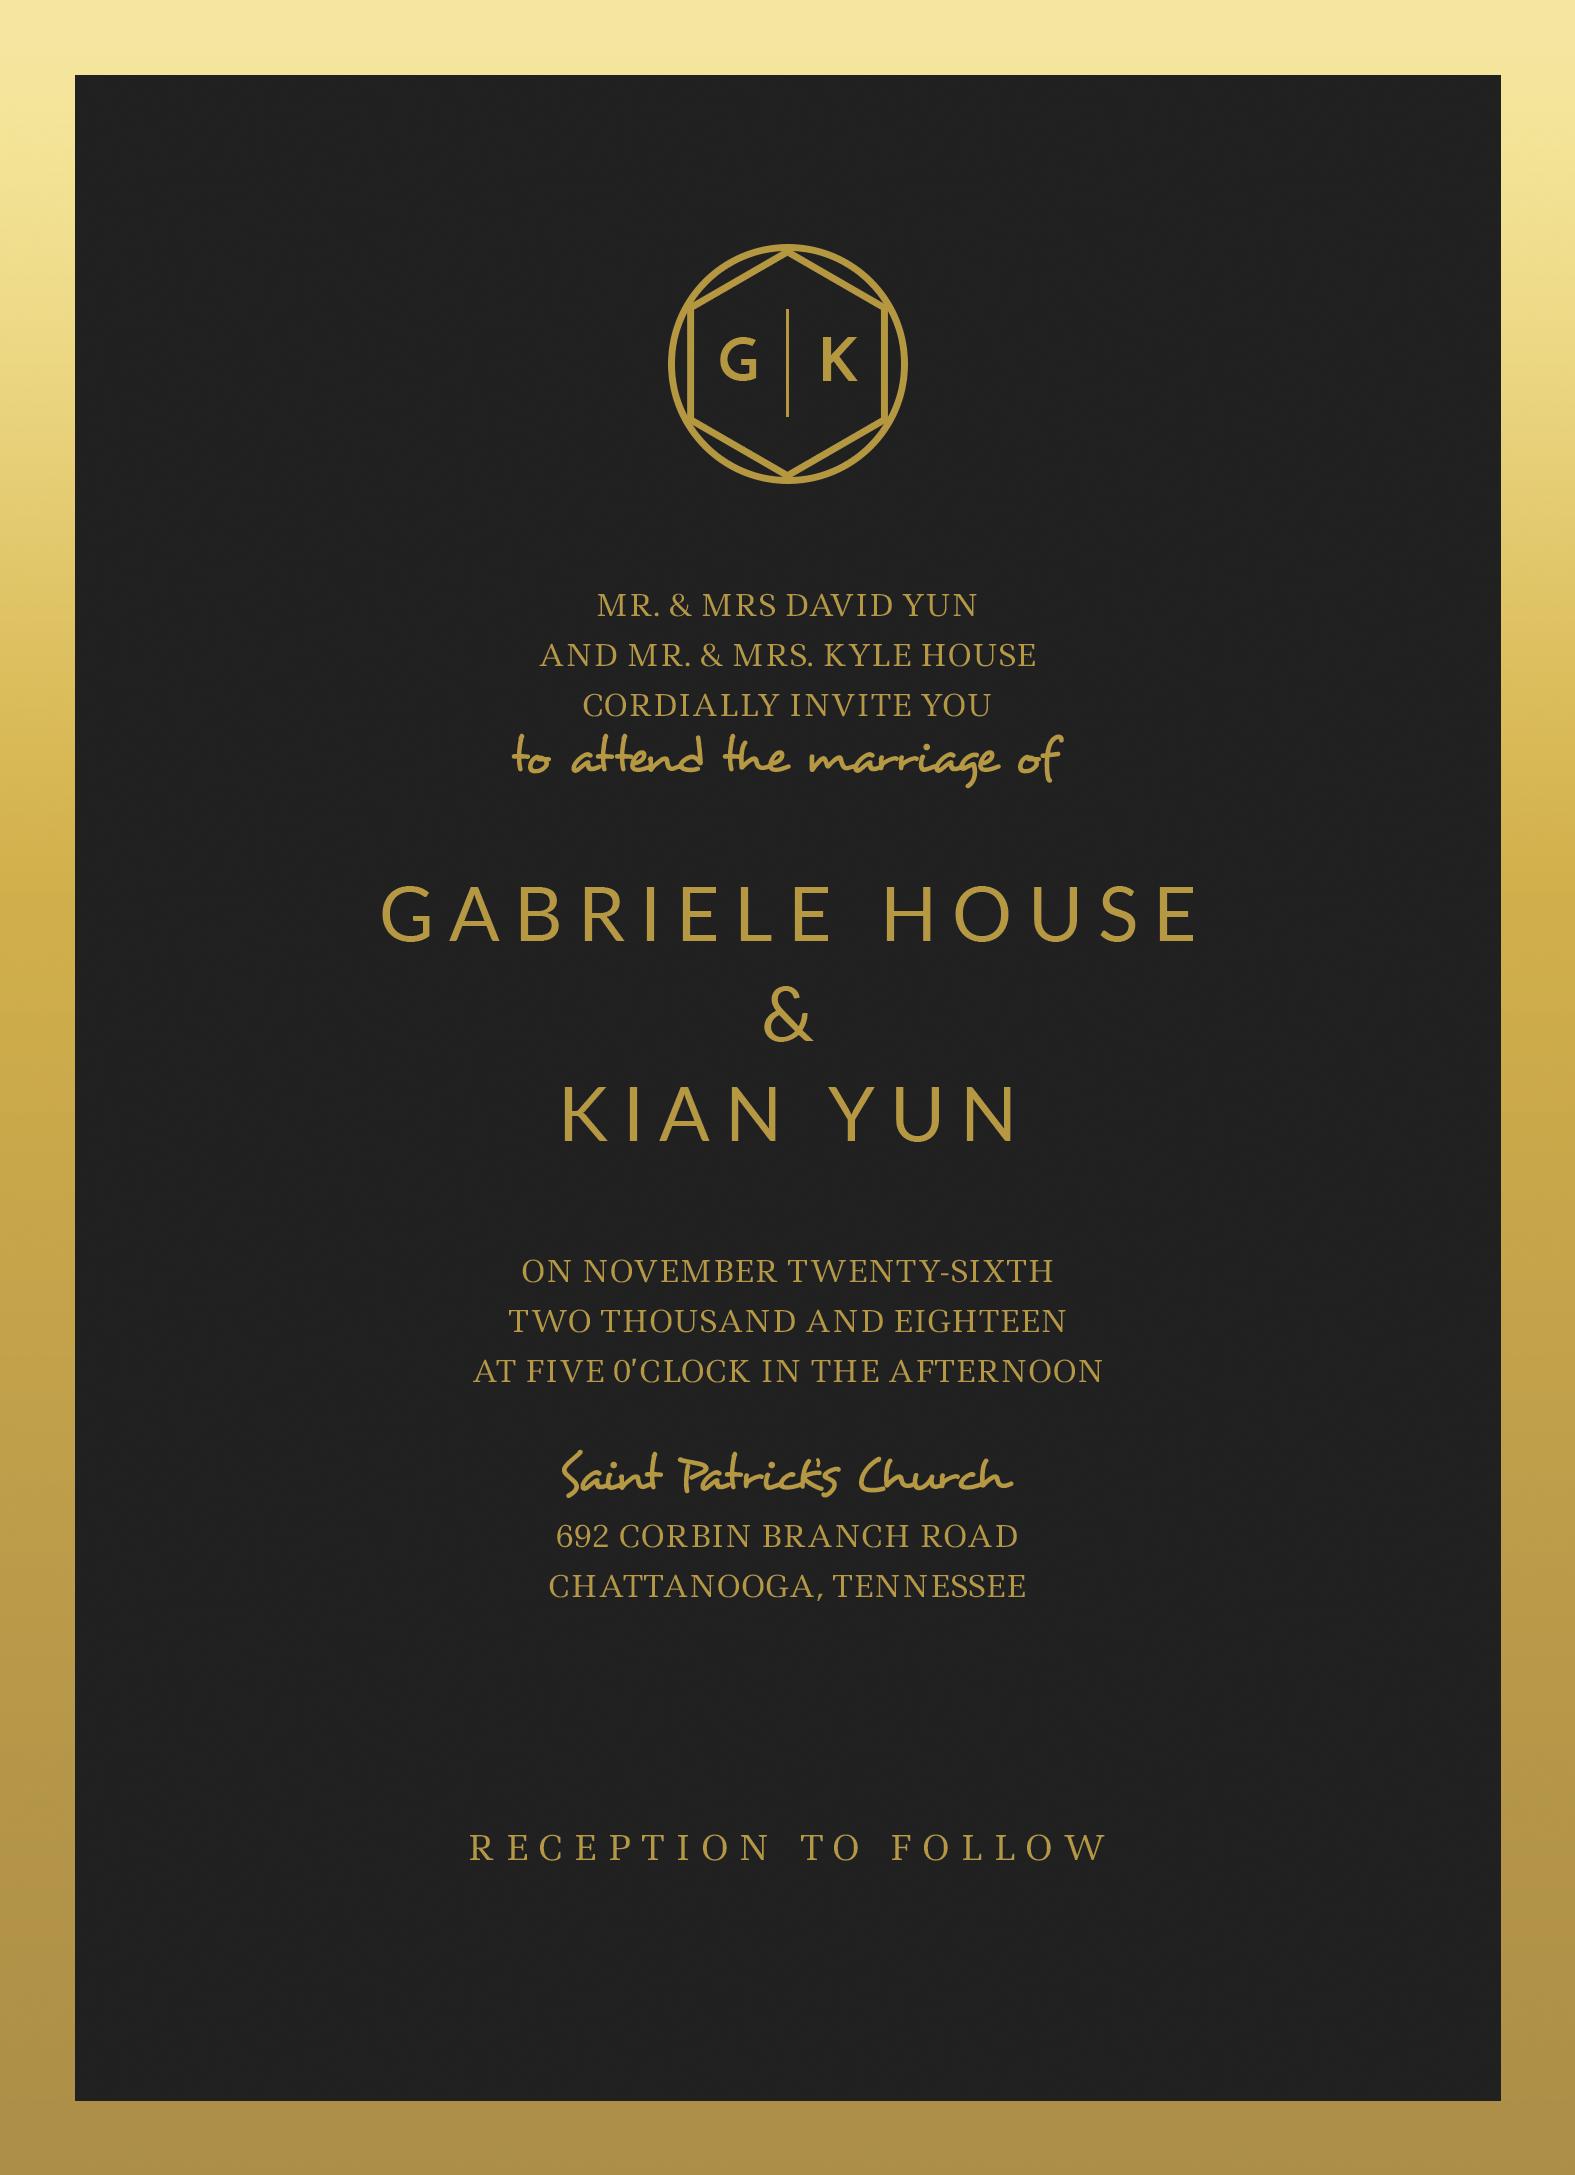 All Wedding Invitations